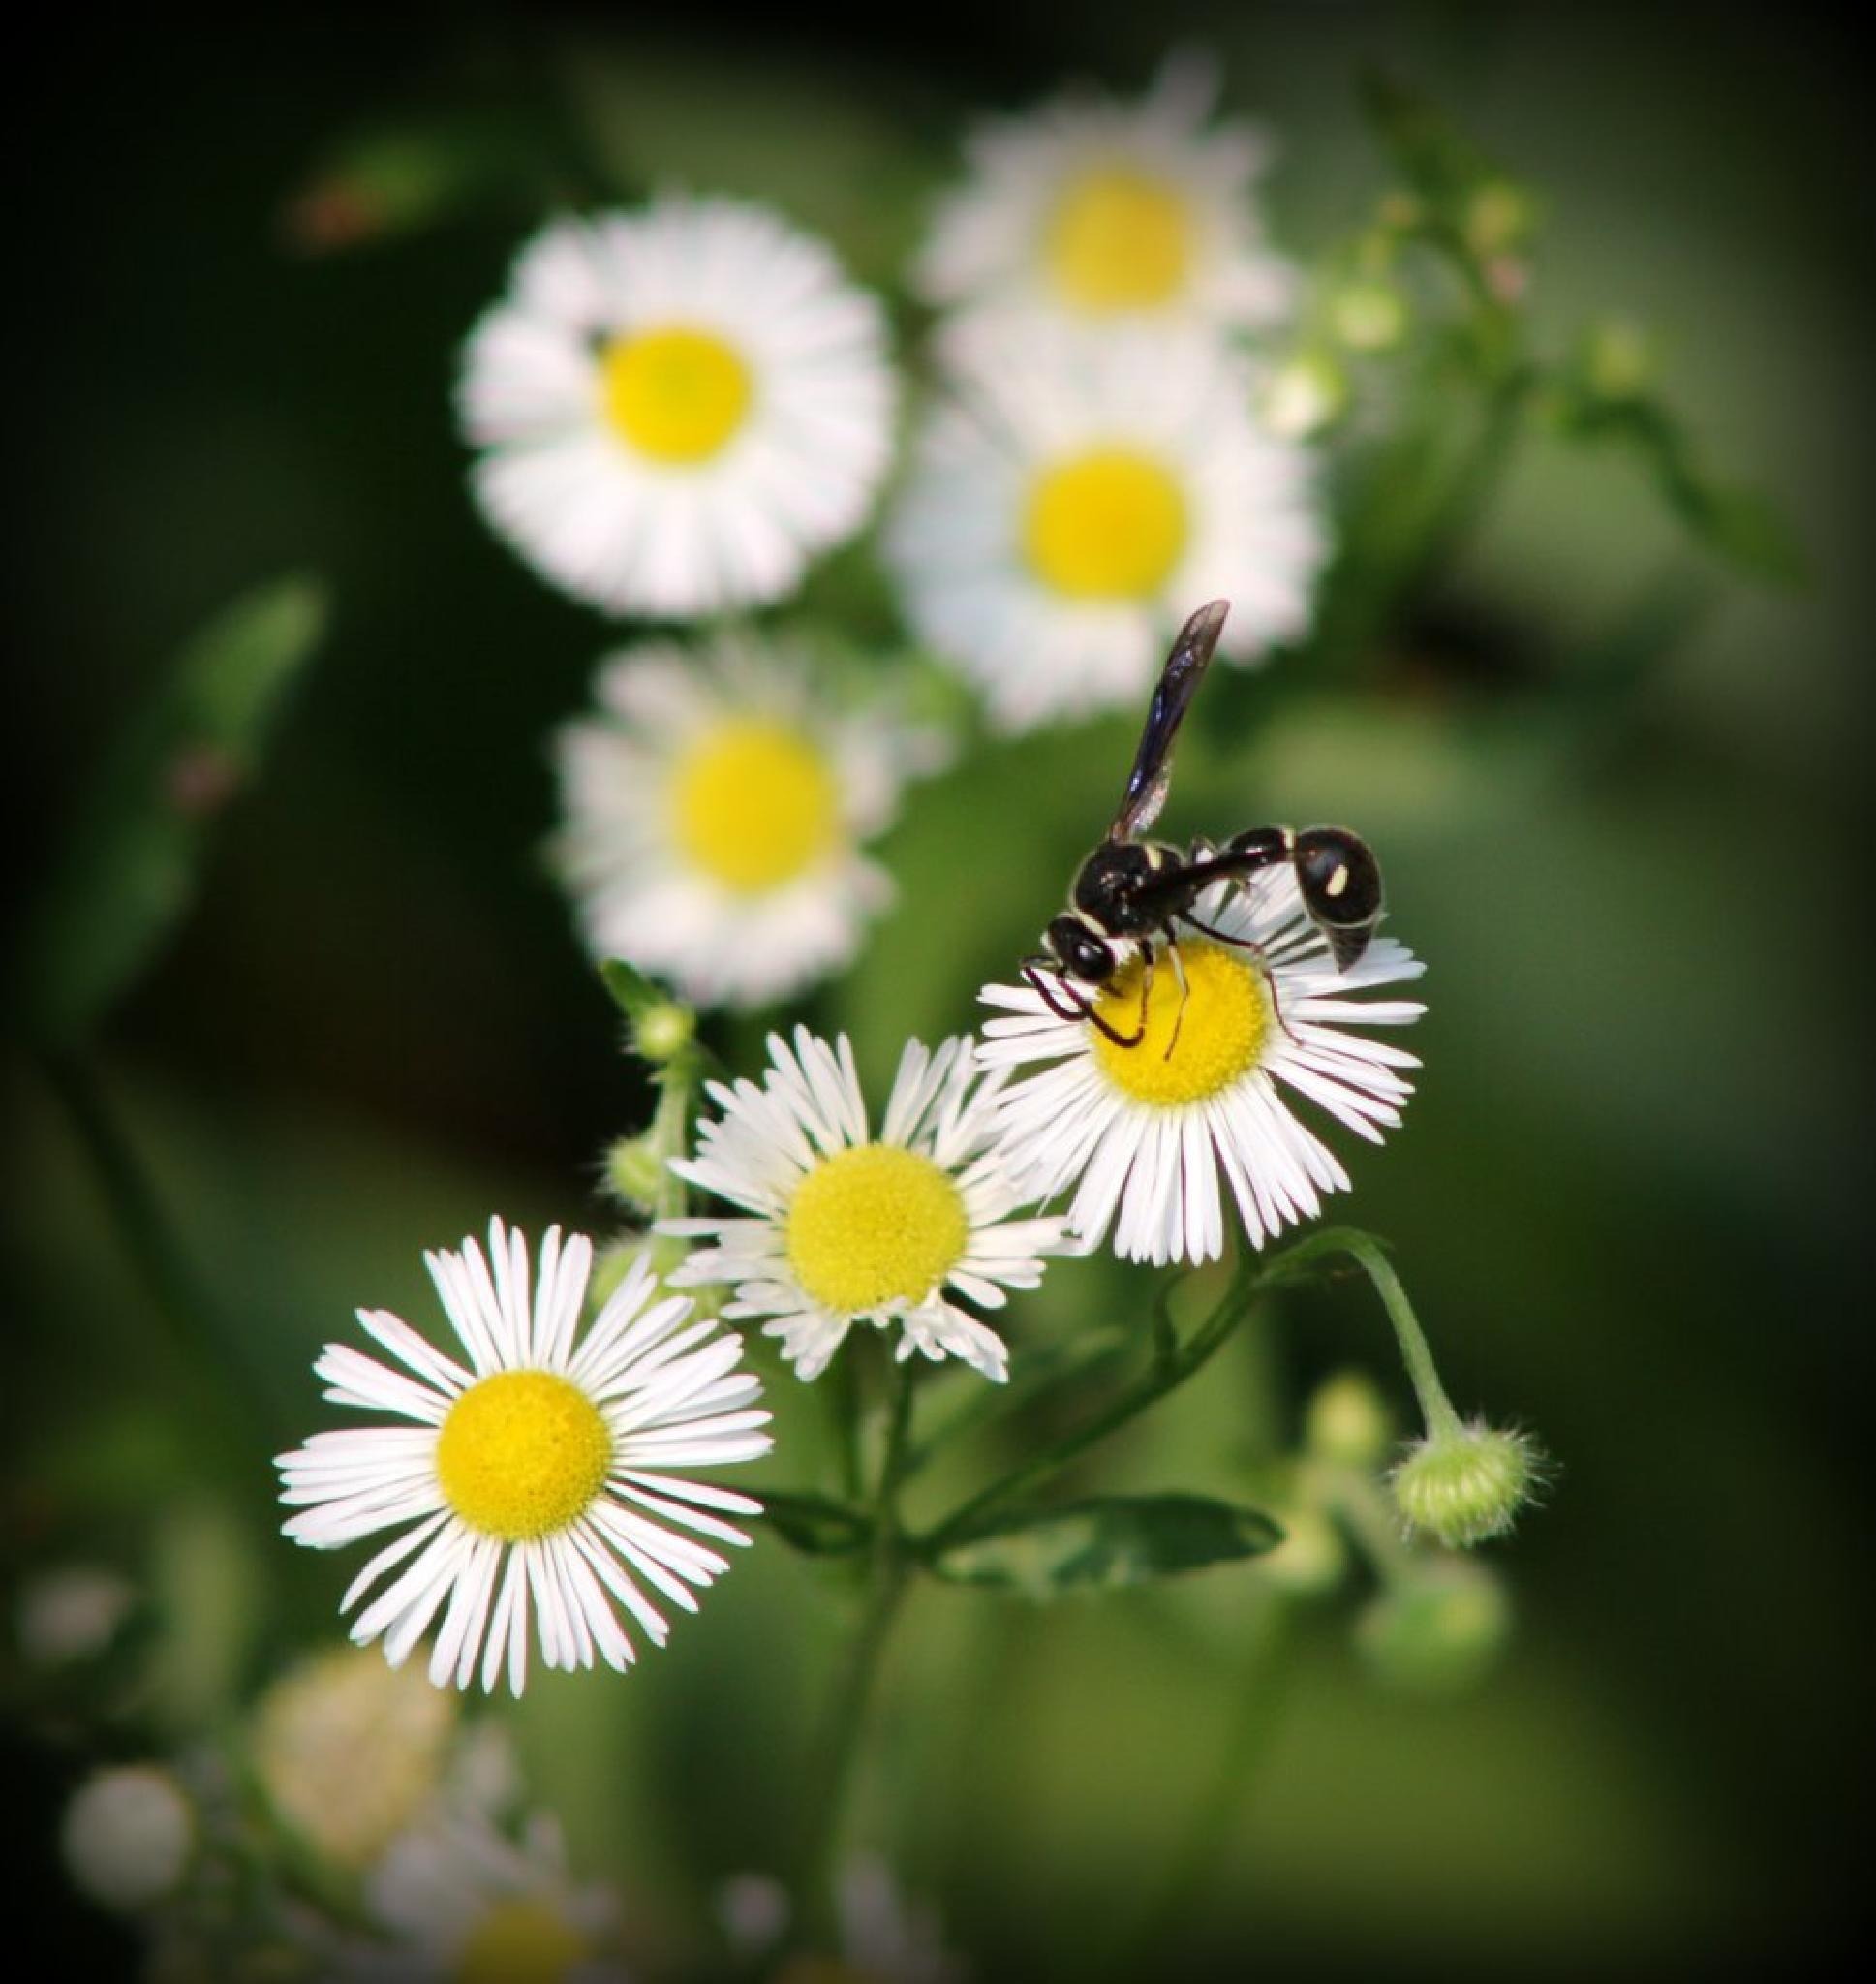 Flowers by angelgirlbroken